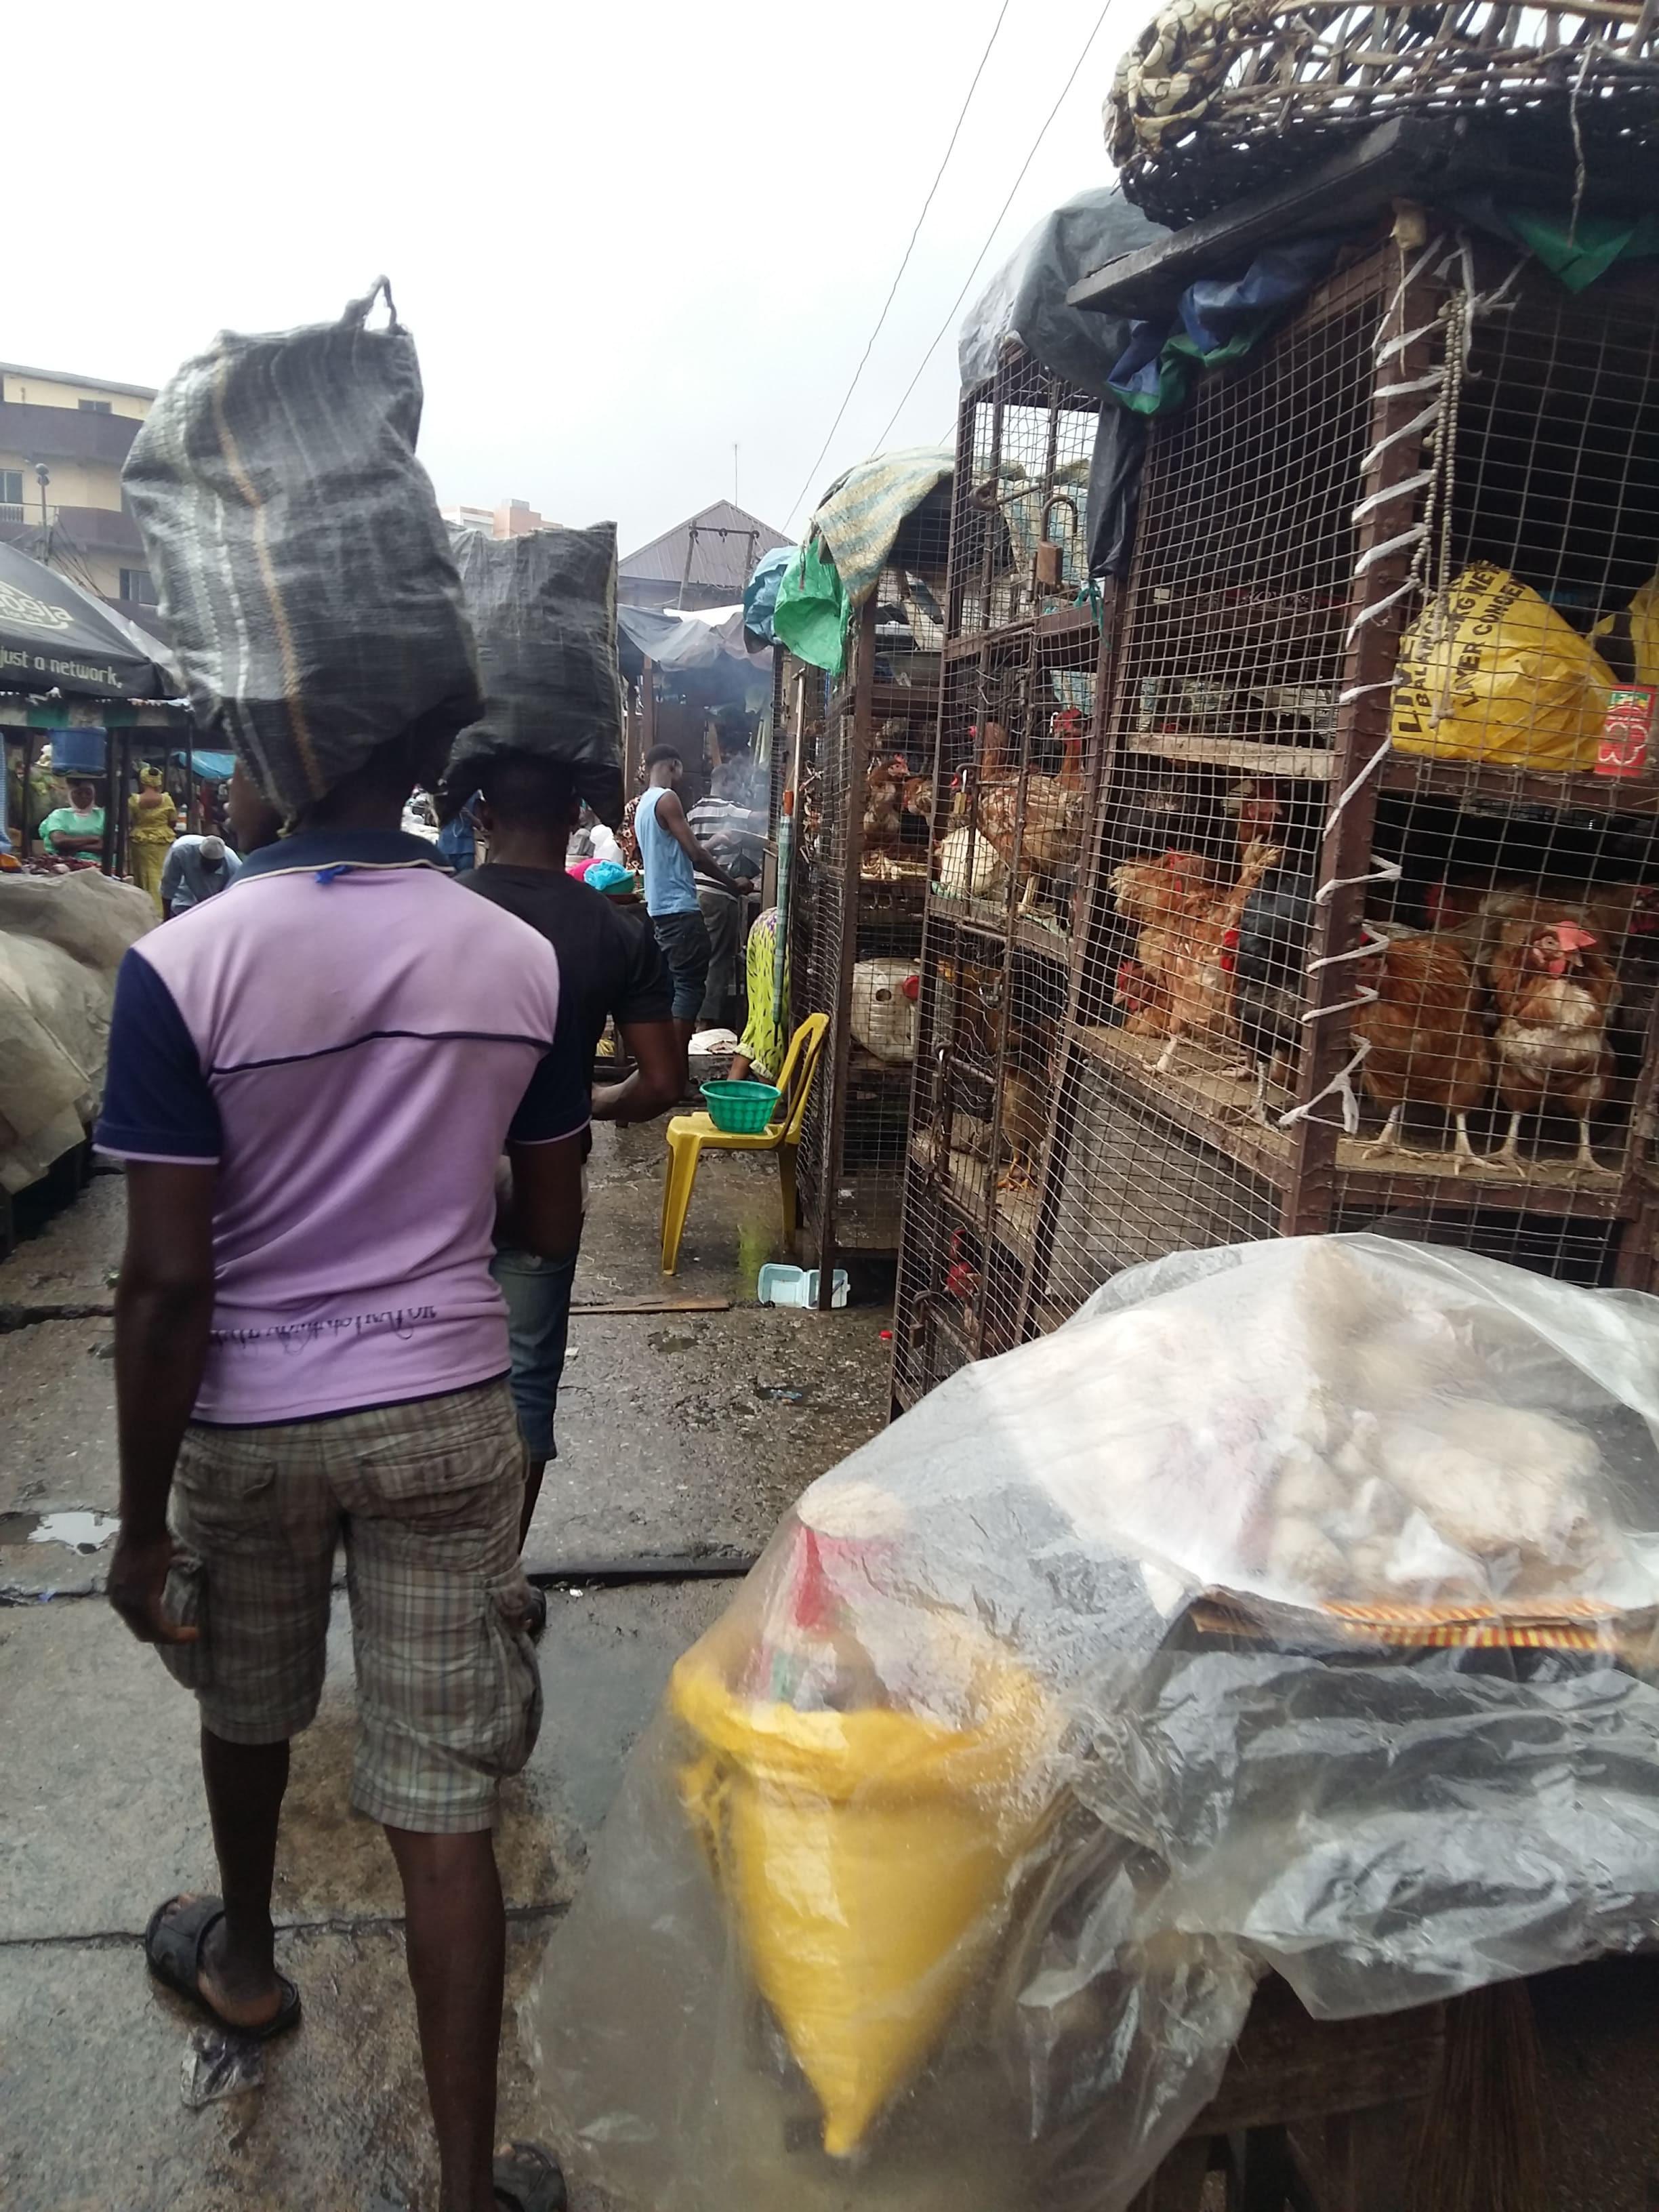 The Essential Guide To Lagos' Jankara Market